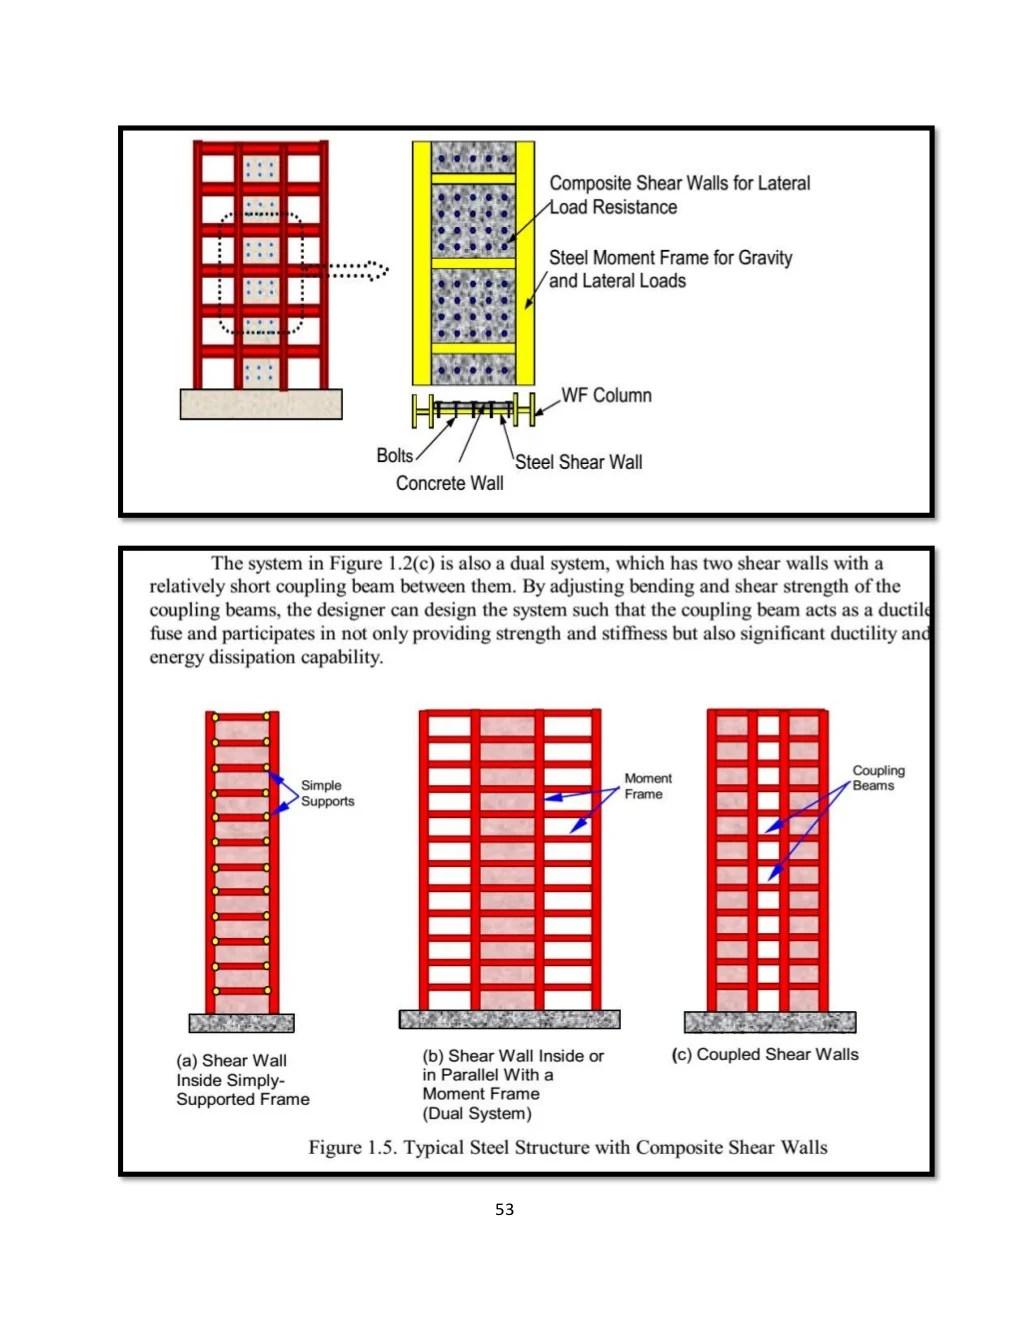 seismic-design-of-composite-shear-walls-frames-53-1024.jpg